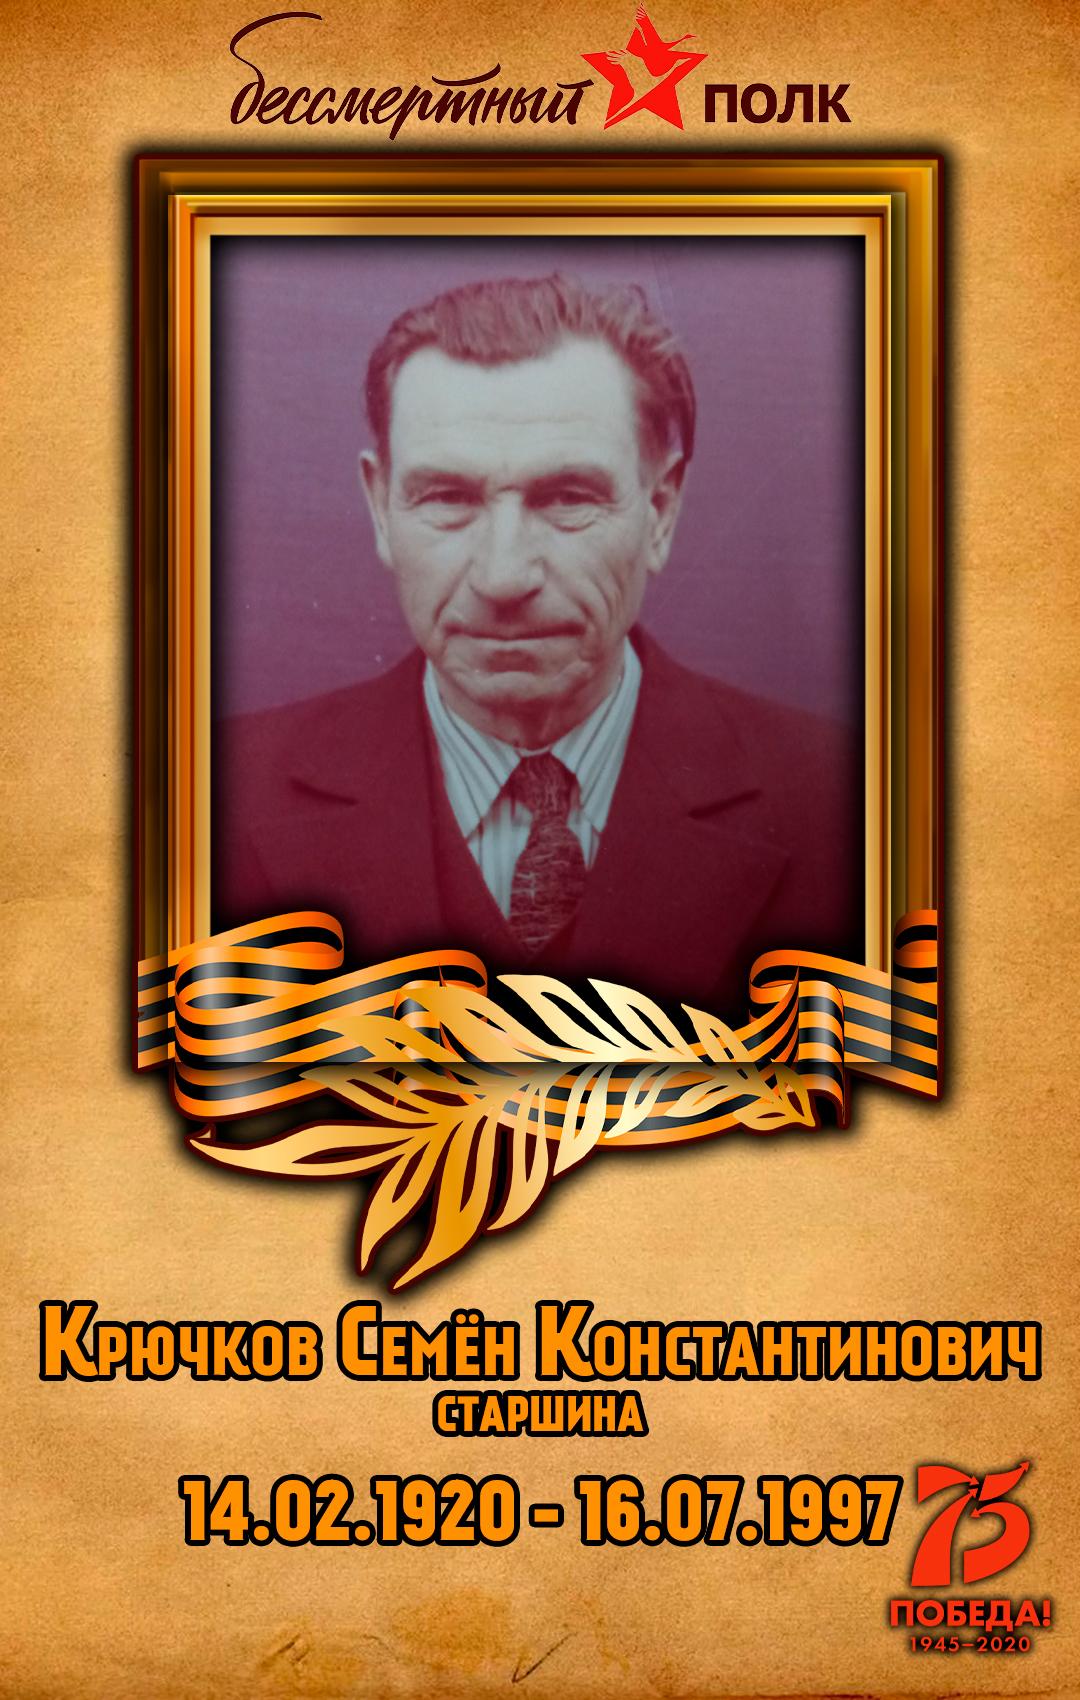 Крючков-Семён-Константинович